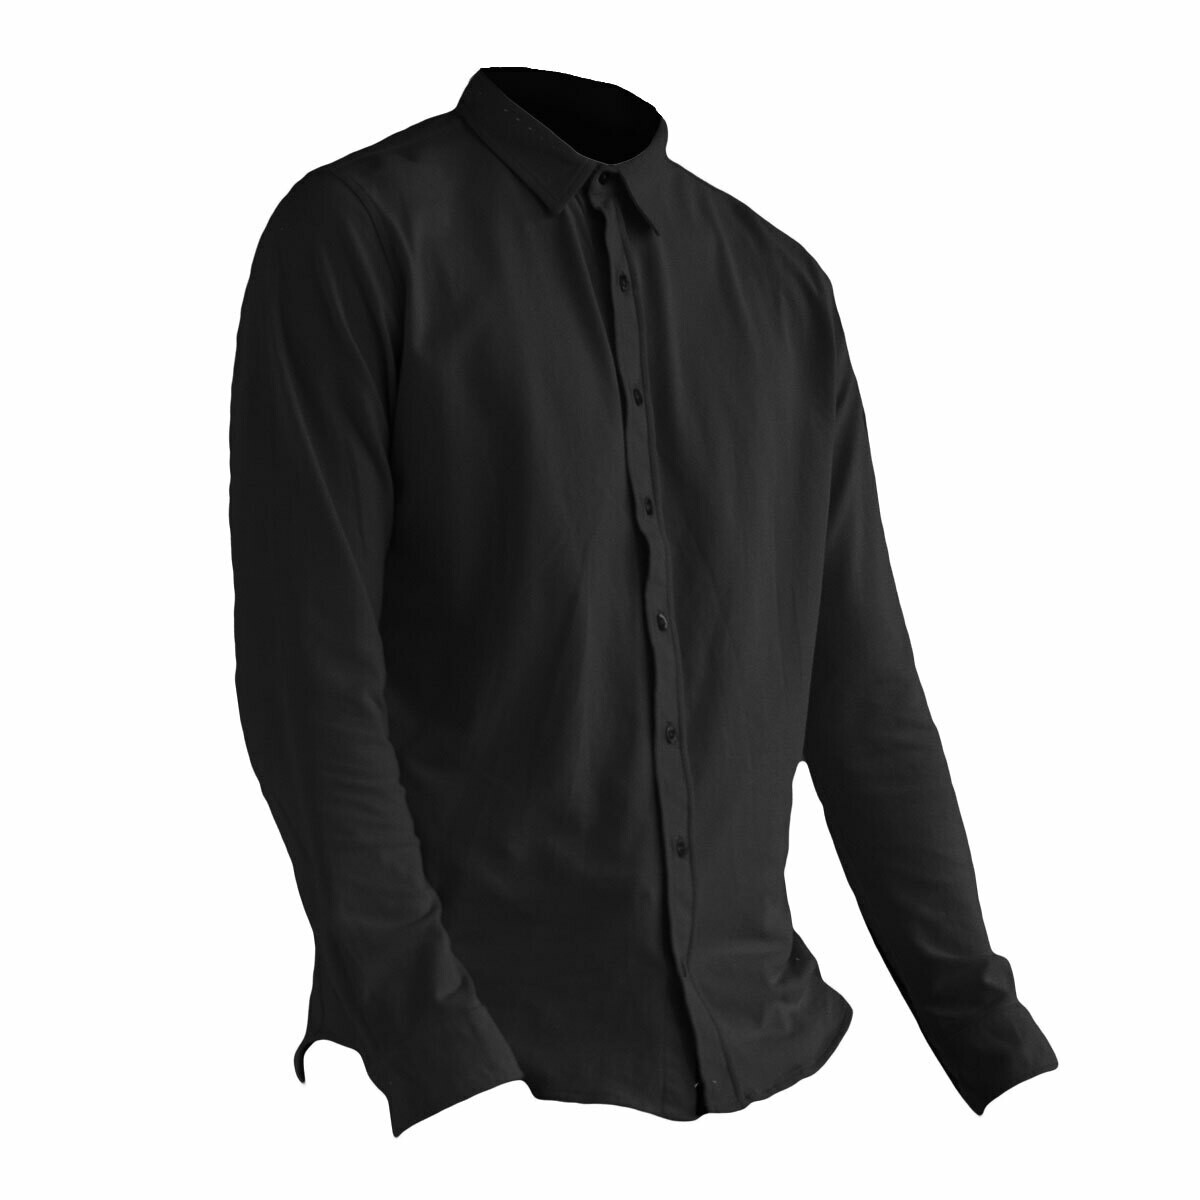 Camicia Knitted Uomo